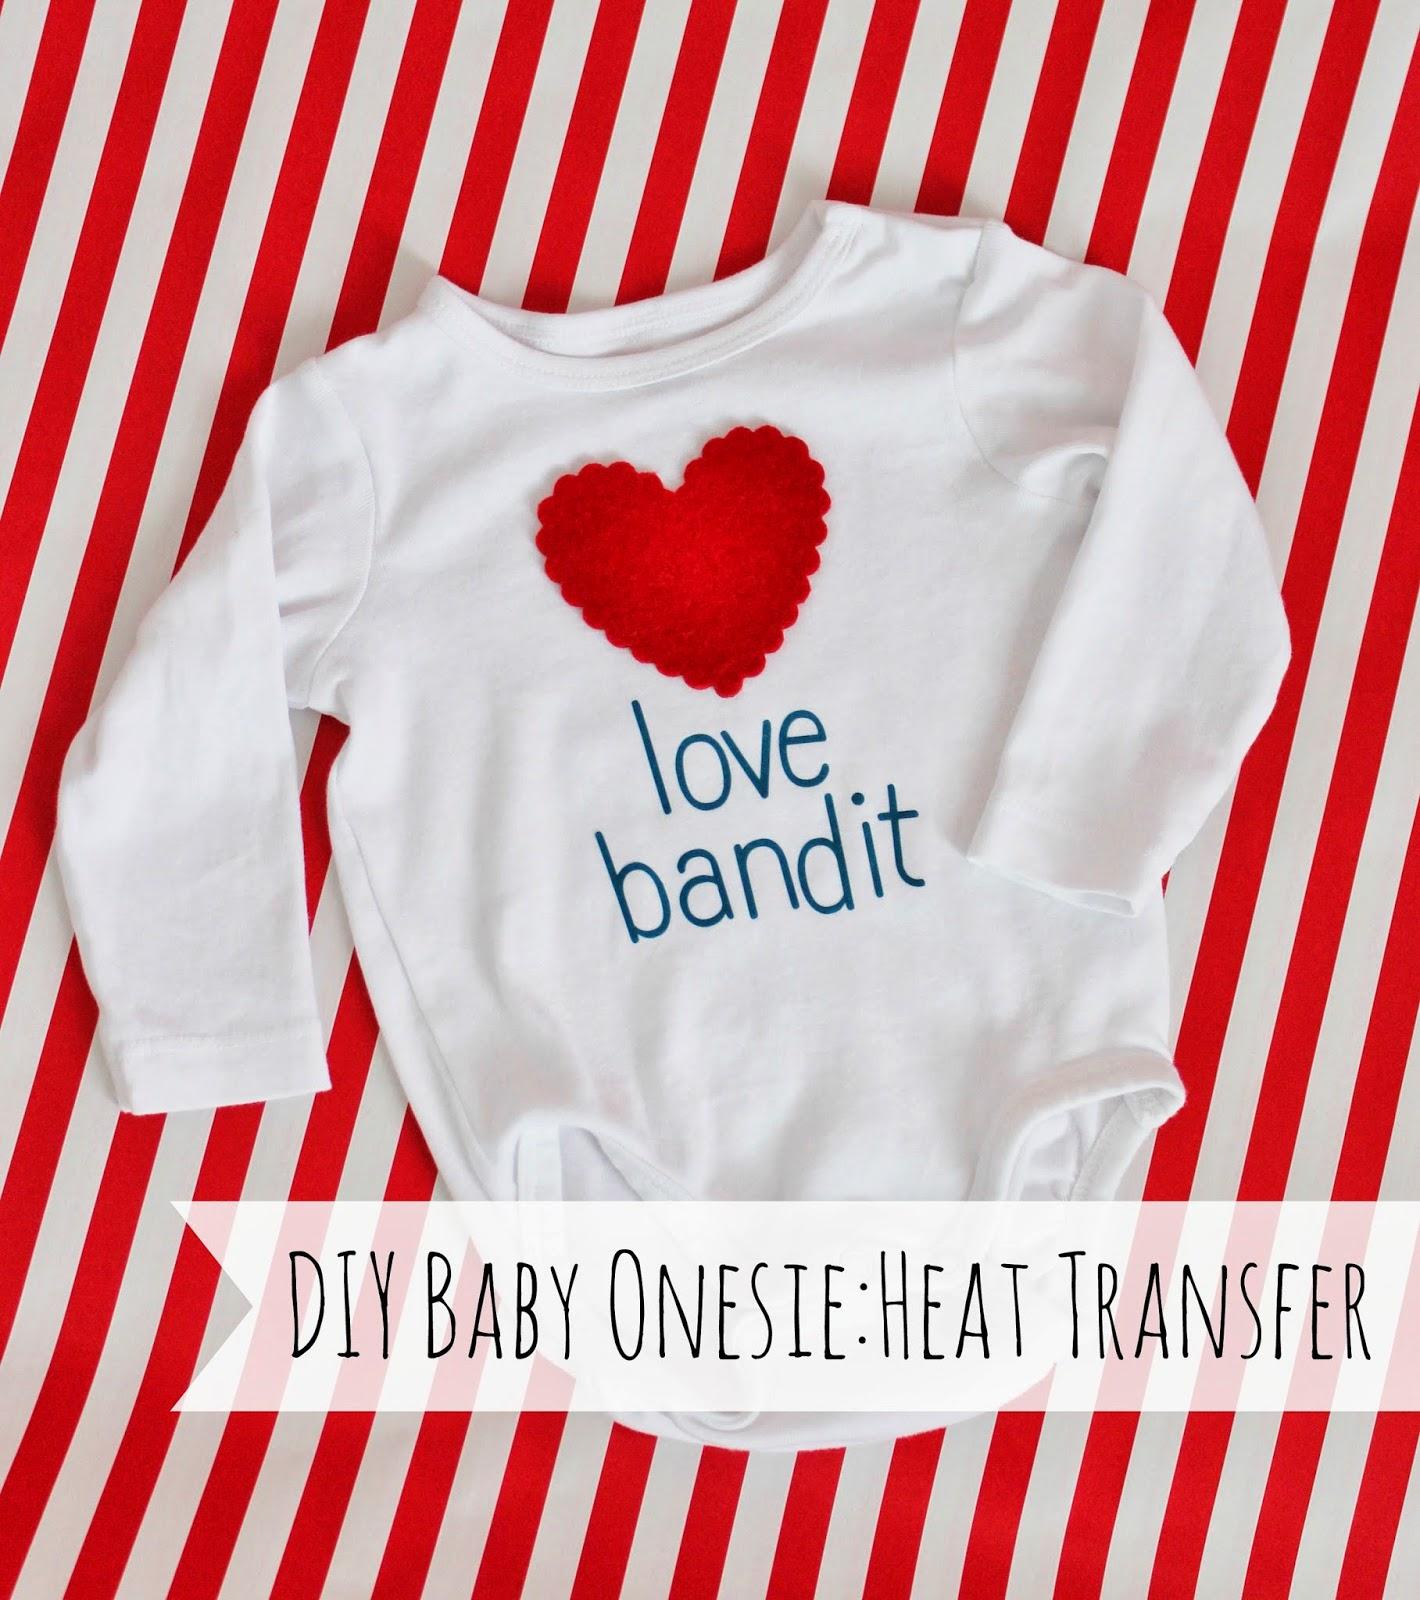 heat transfer vinyl baby onesie